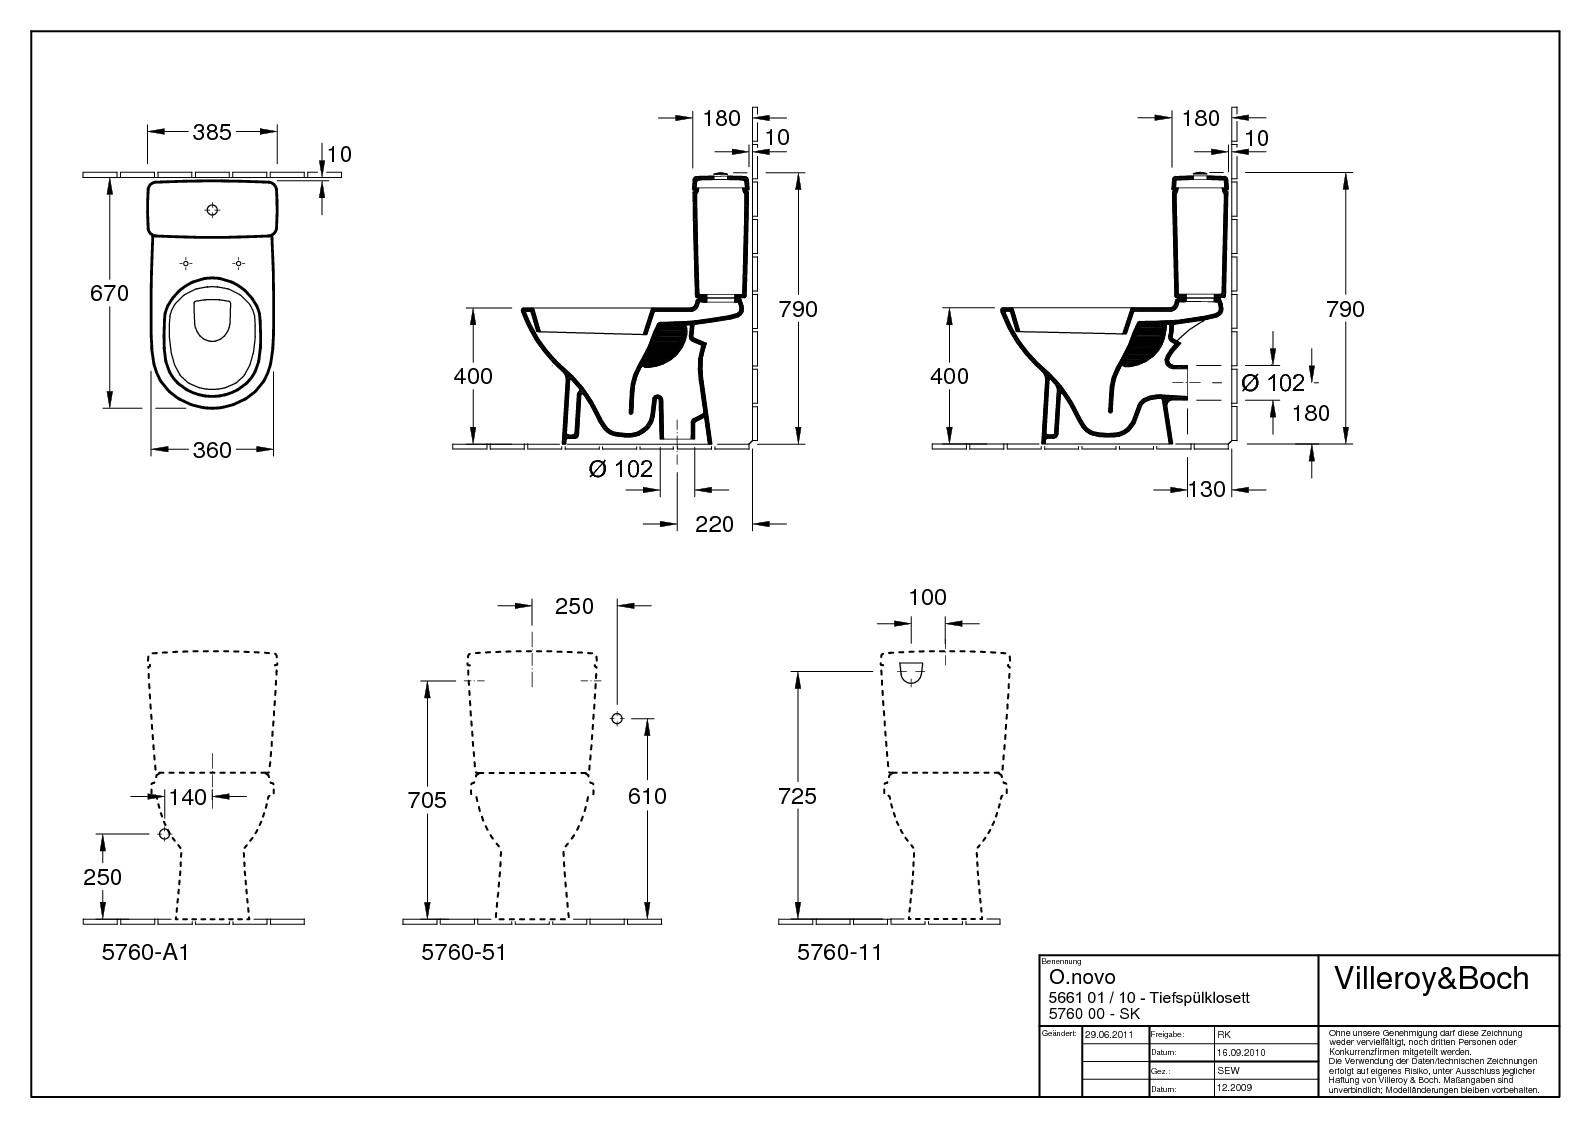 villeroy boch o novo tiefsp lklosett f r kombination stand wc abgang senkrecht mit sp lrand. Black Bedroom Furniture Sets. Home Design Ideas